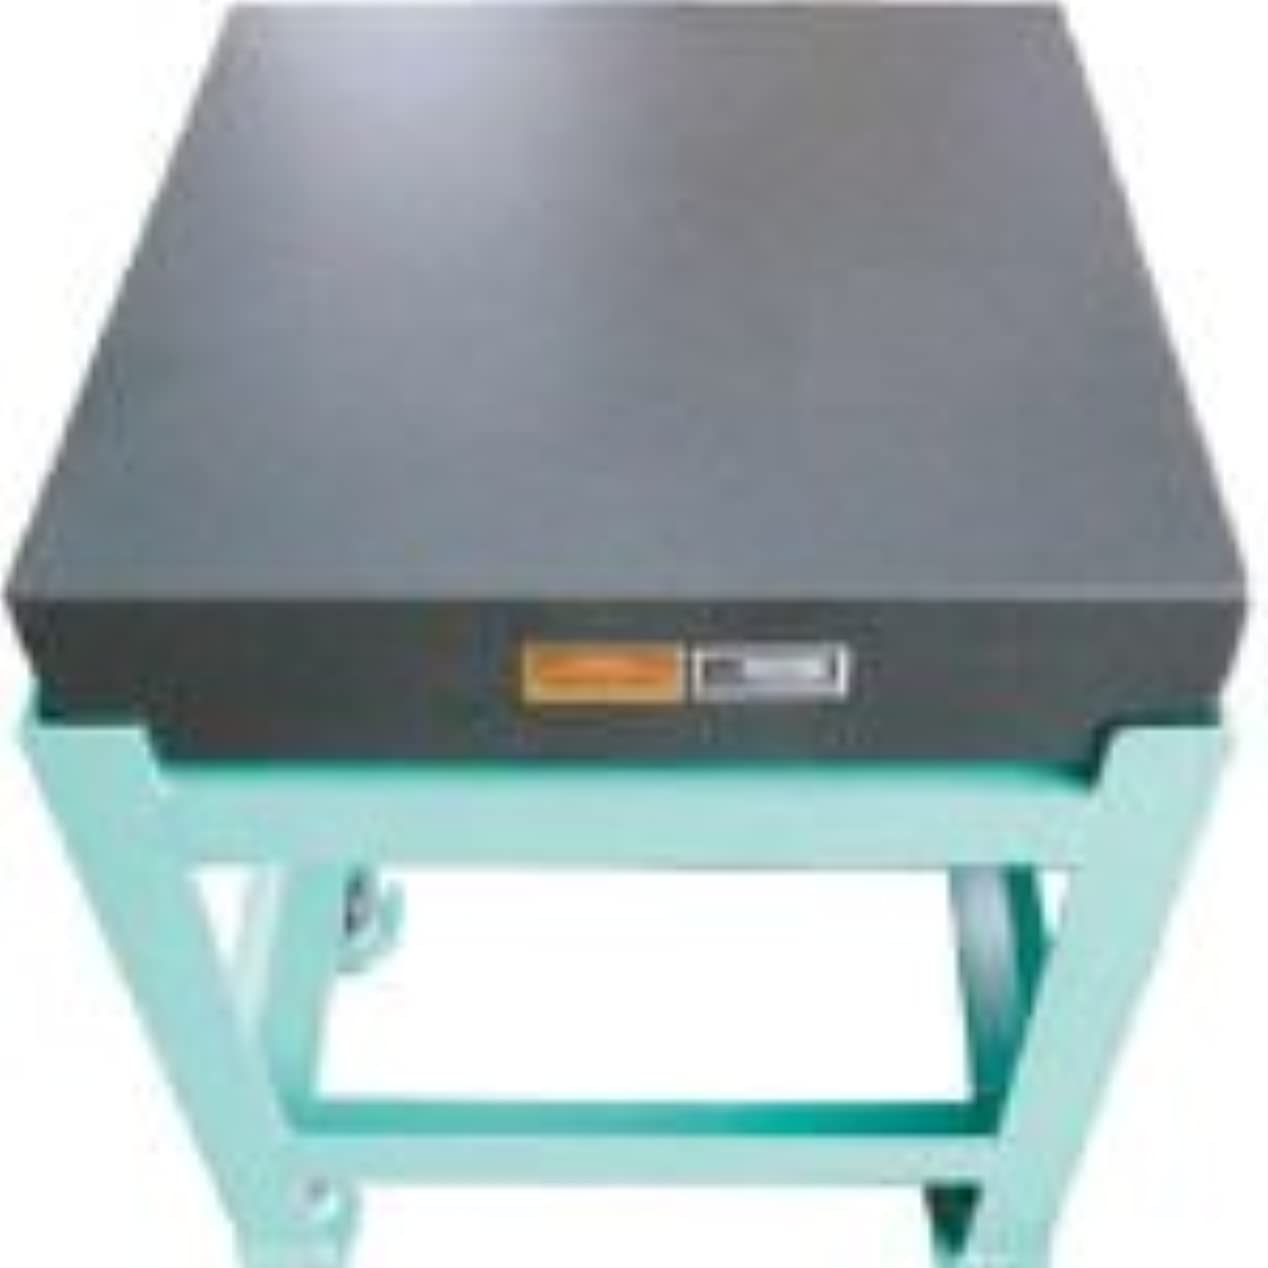 廃止アッパー顔料OSS 精密石定盤(JIS00級)300×300mm 102-3030L00